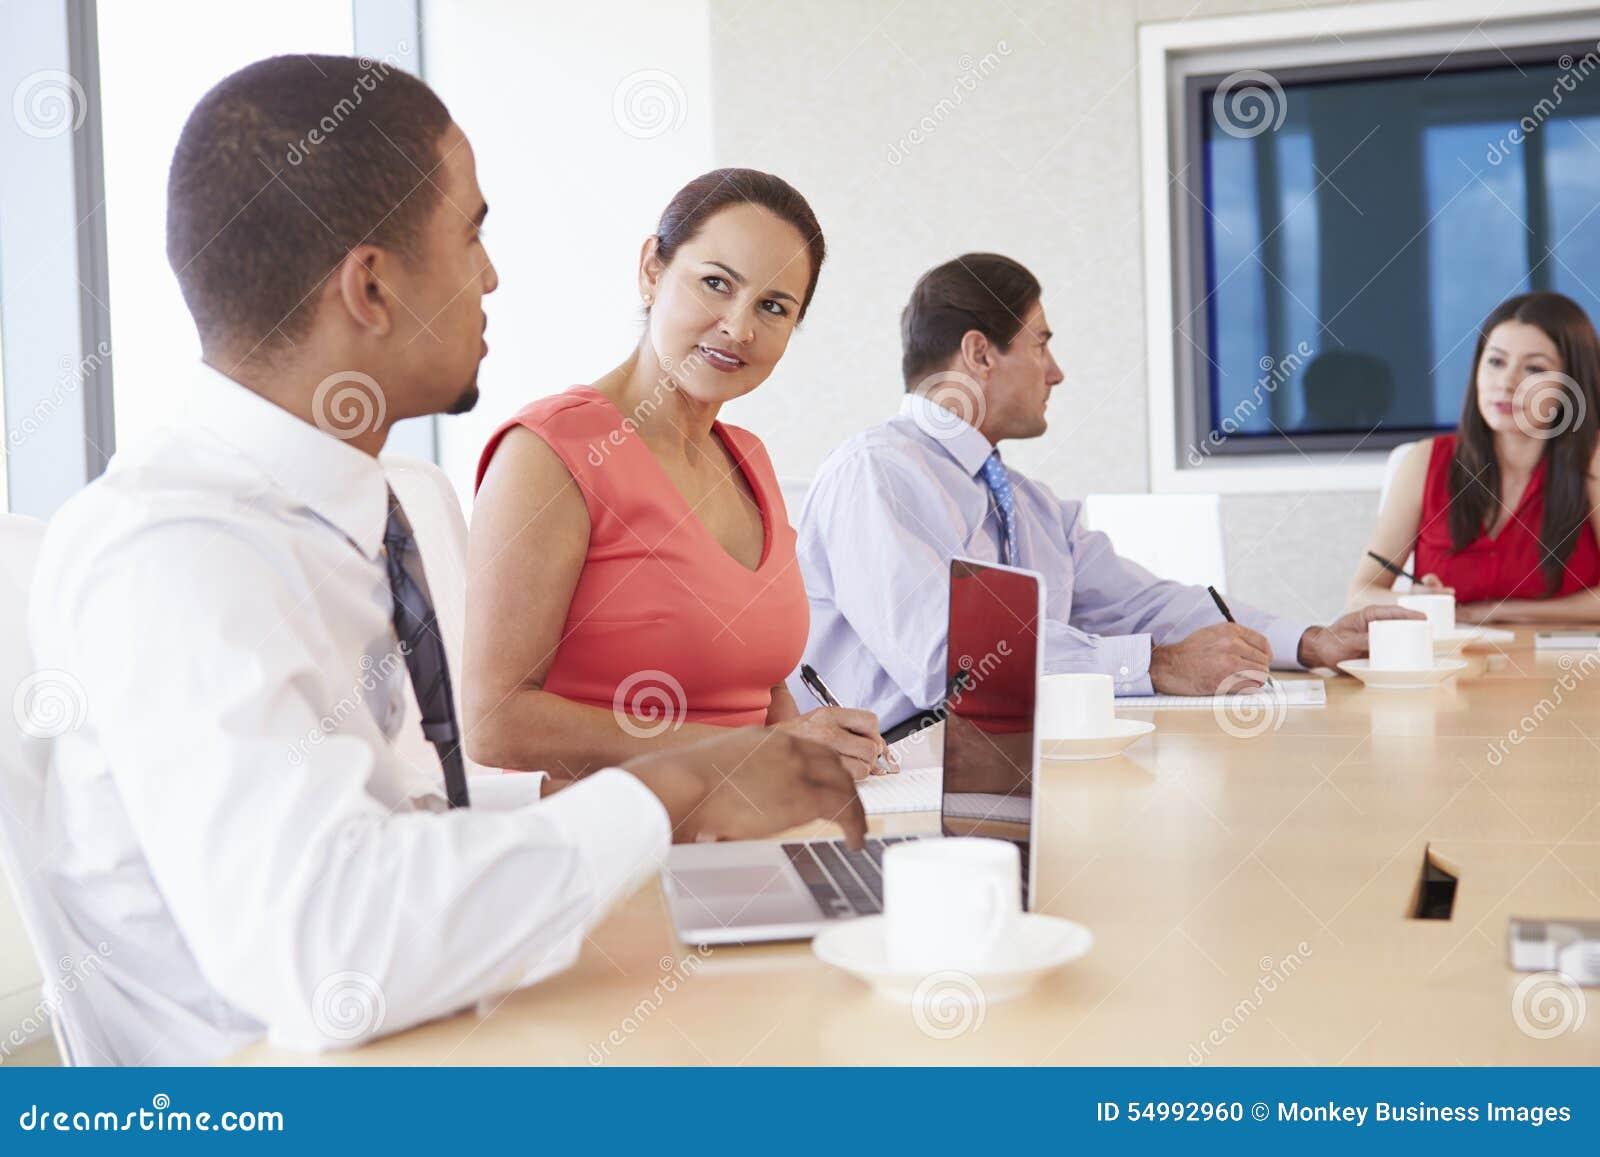 Four Hispanic Businesspeople Having Meeting In Boardroom